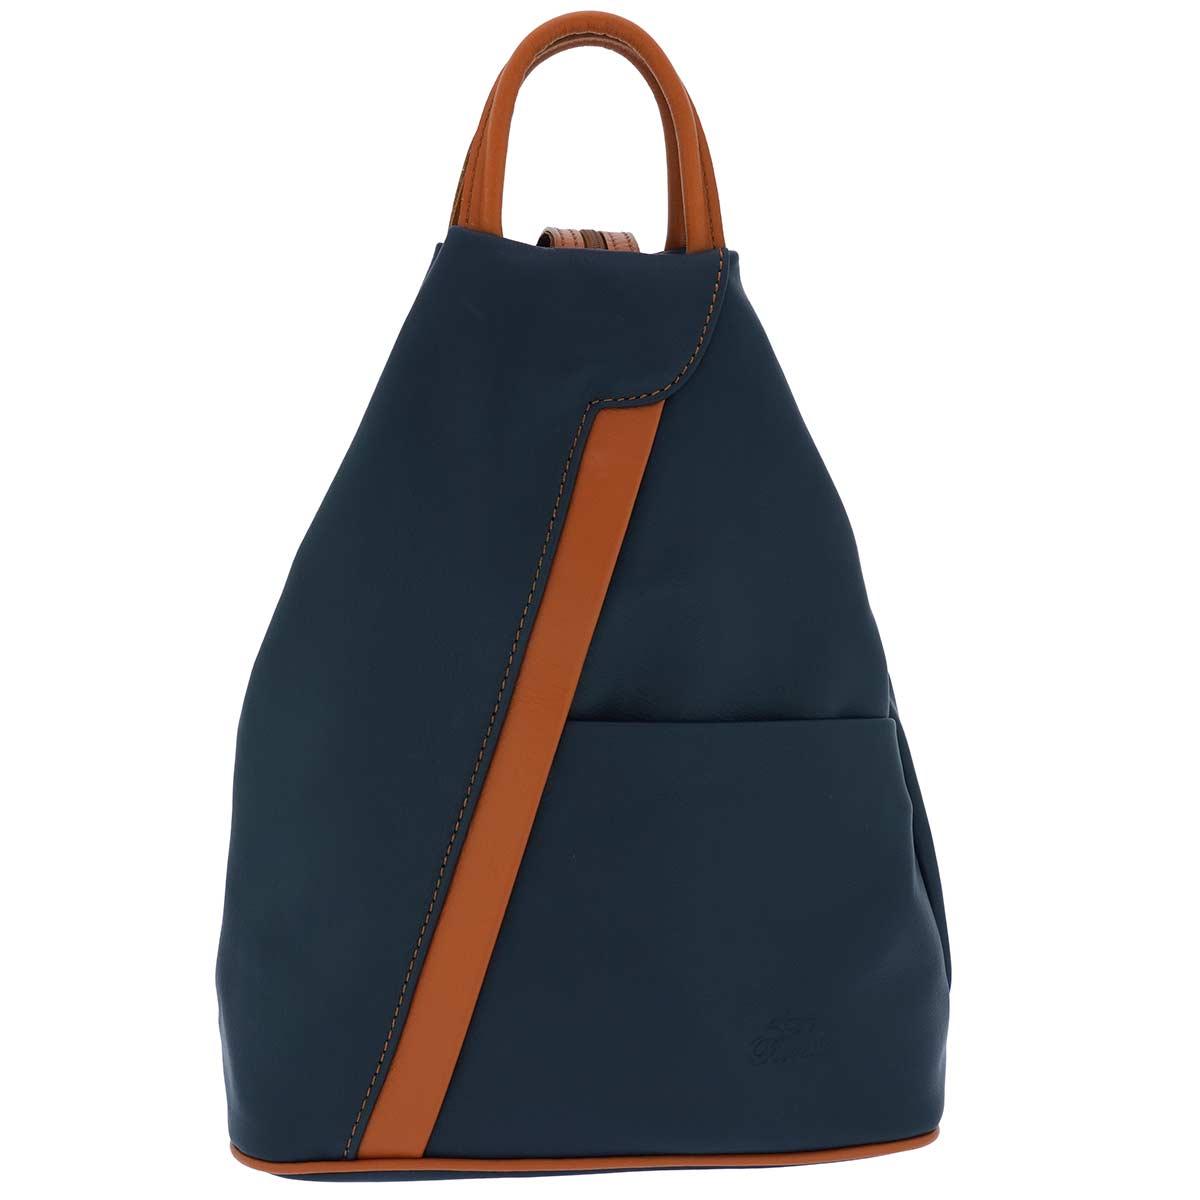 Fioretta Italian Genuine Leather Top Handle Backpack Purse Shoulder Bag Handbag Rucksack For Women - Blue Brown